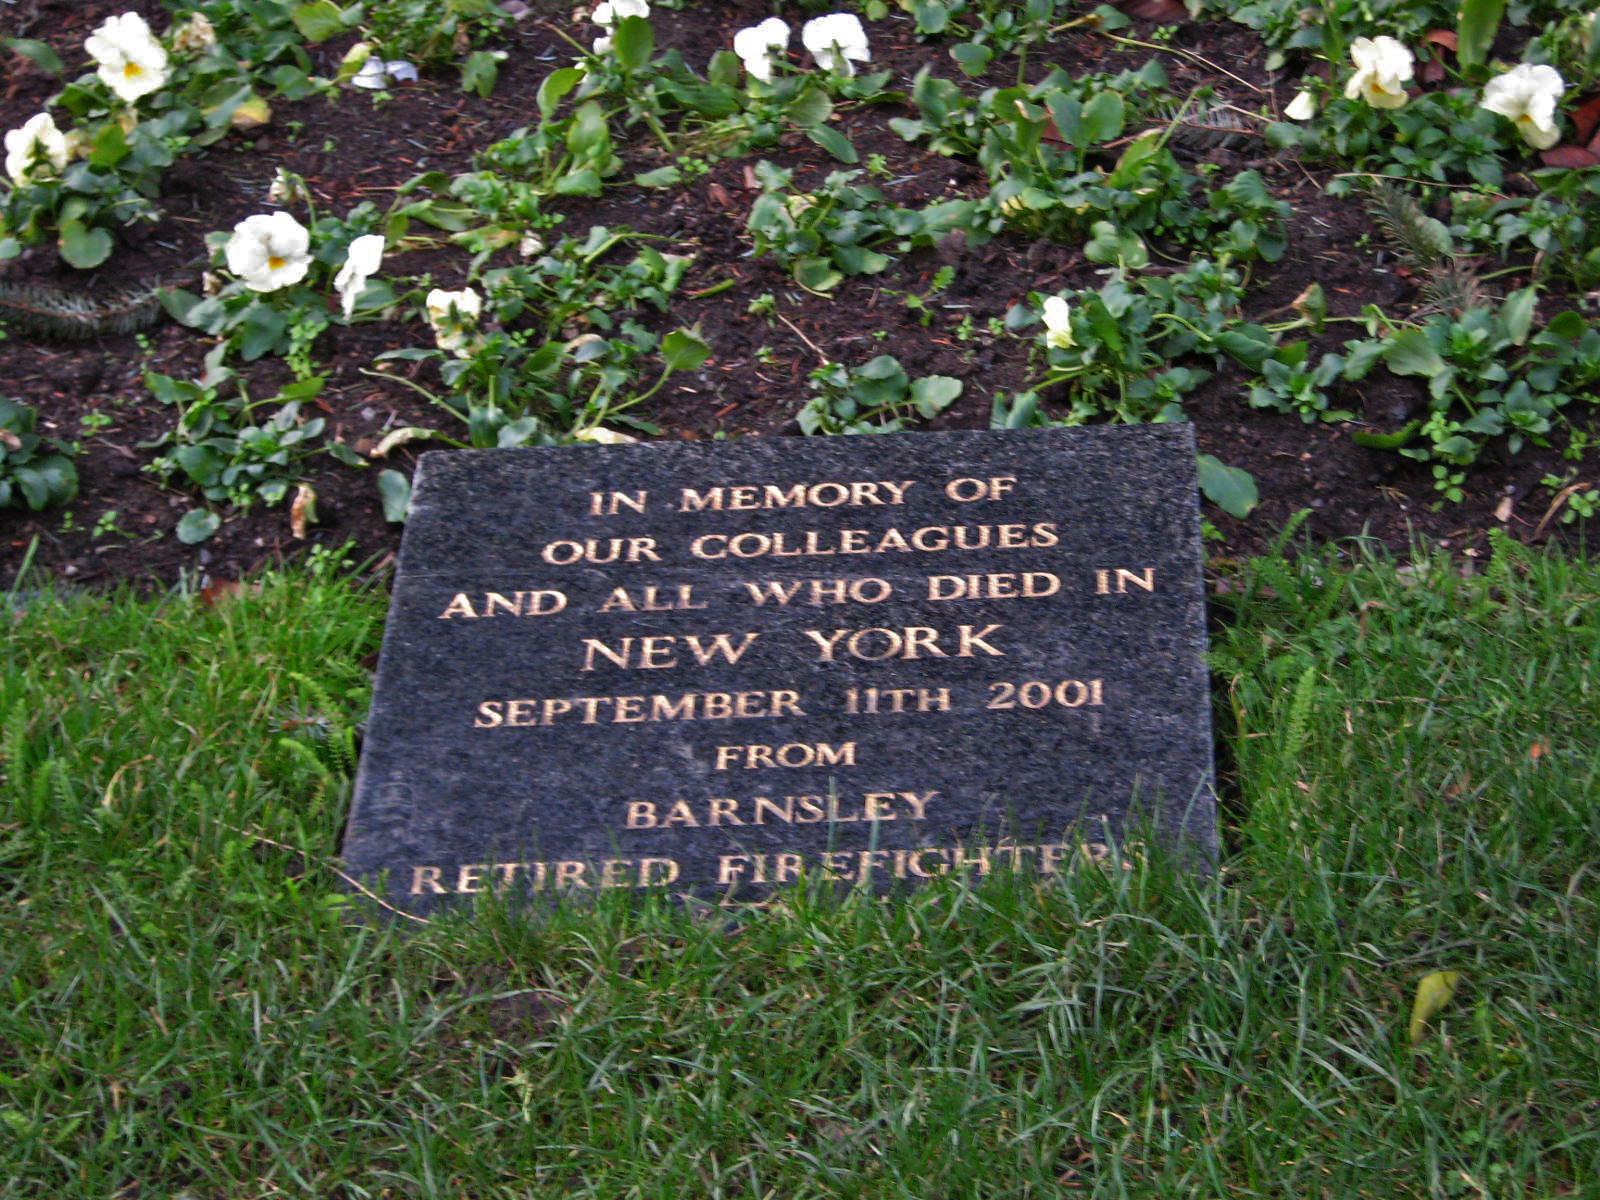 Barnsley memorial stone 1.jpg